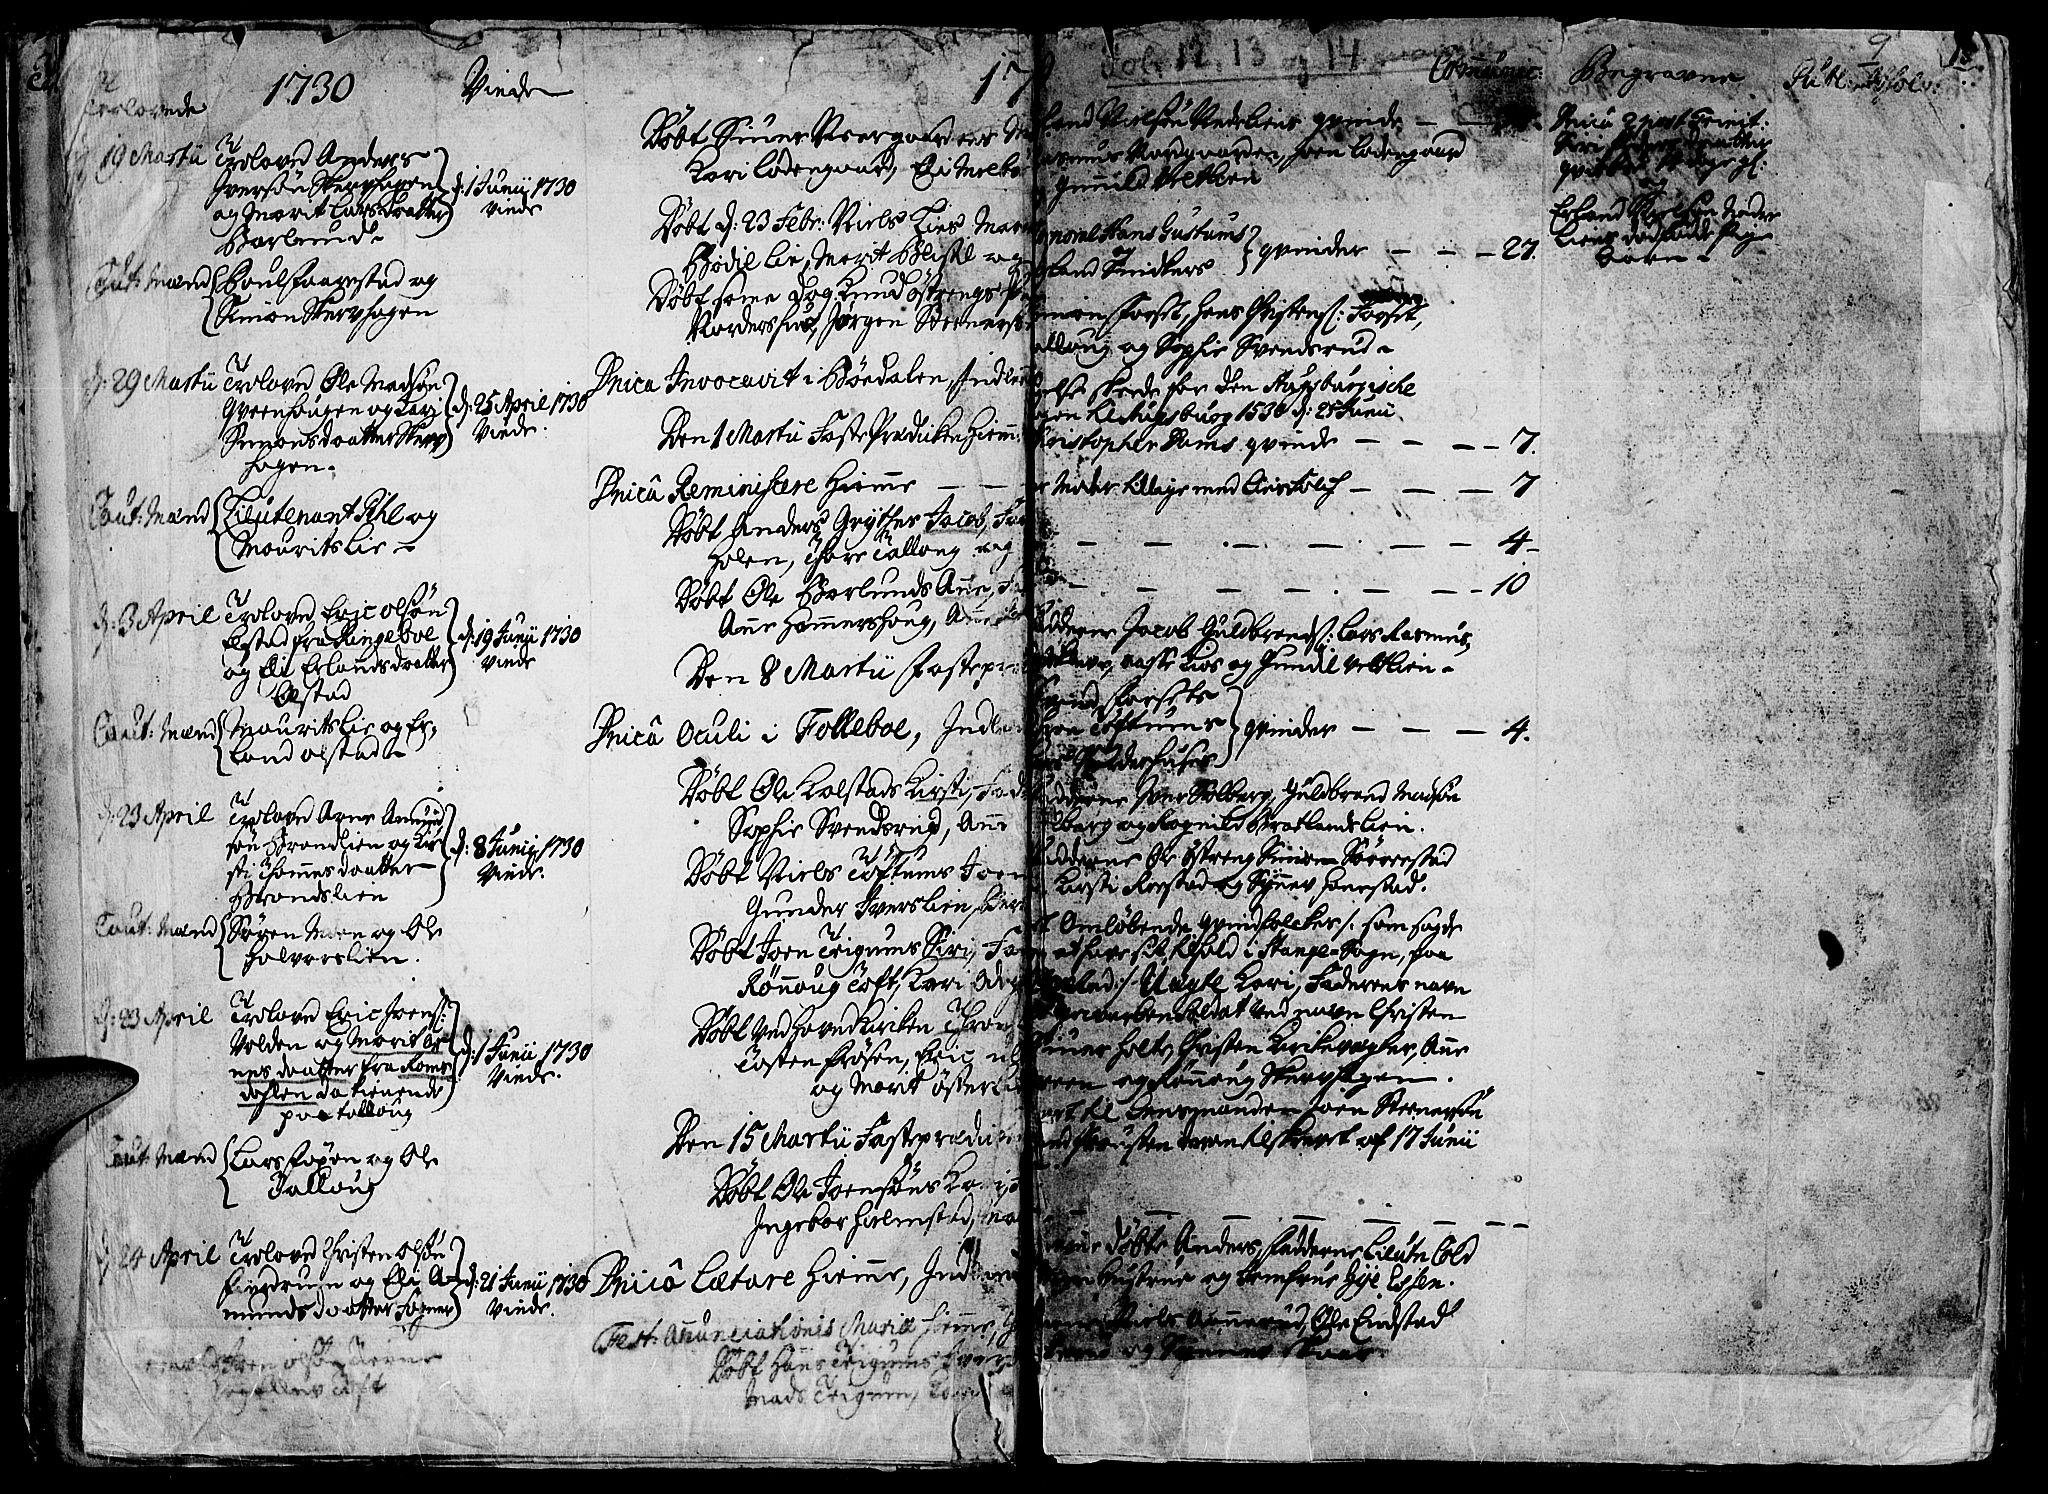 SAH, Gausdal prestekontor, Ministerialbok nr. 2, 1729-1757, s. 9